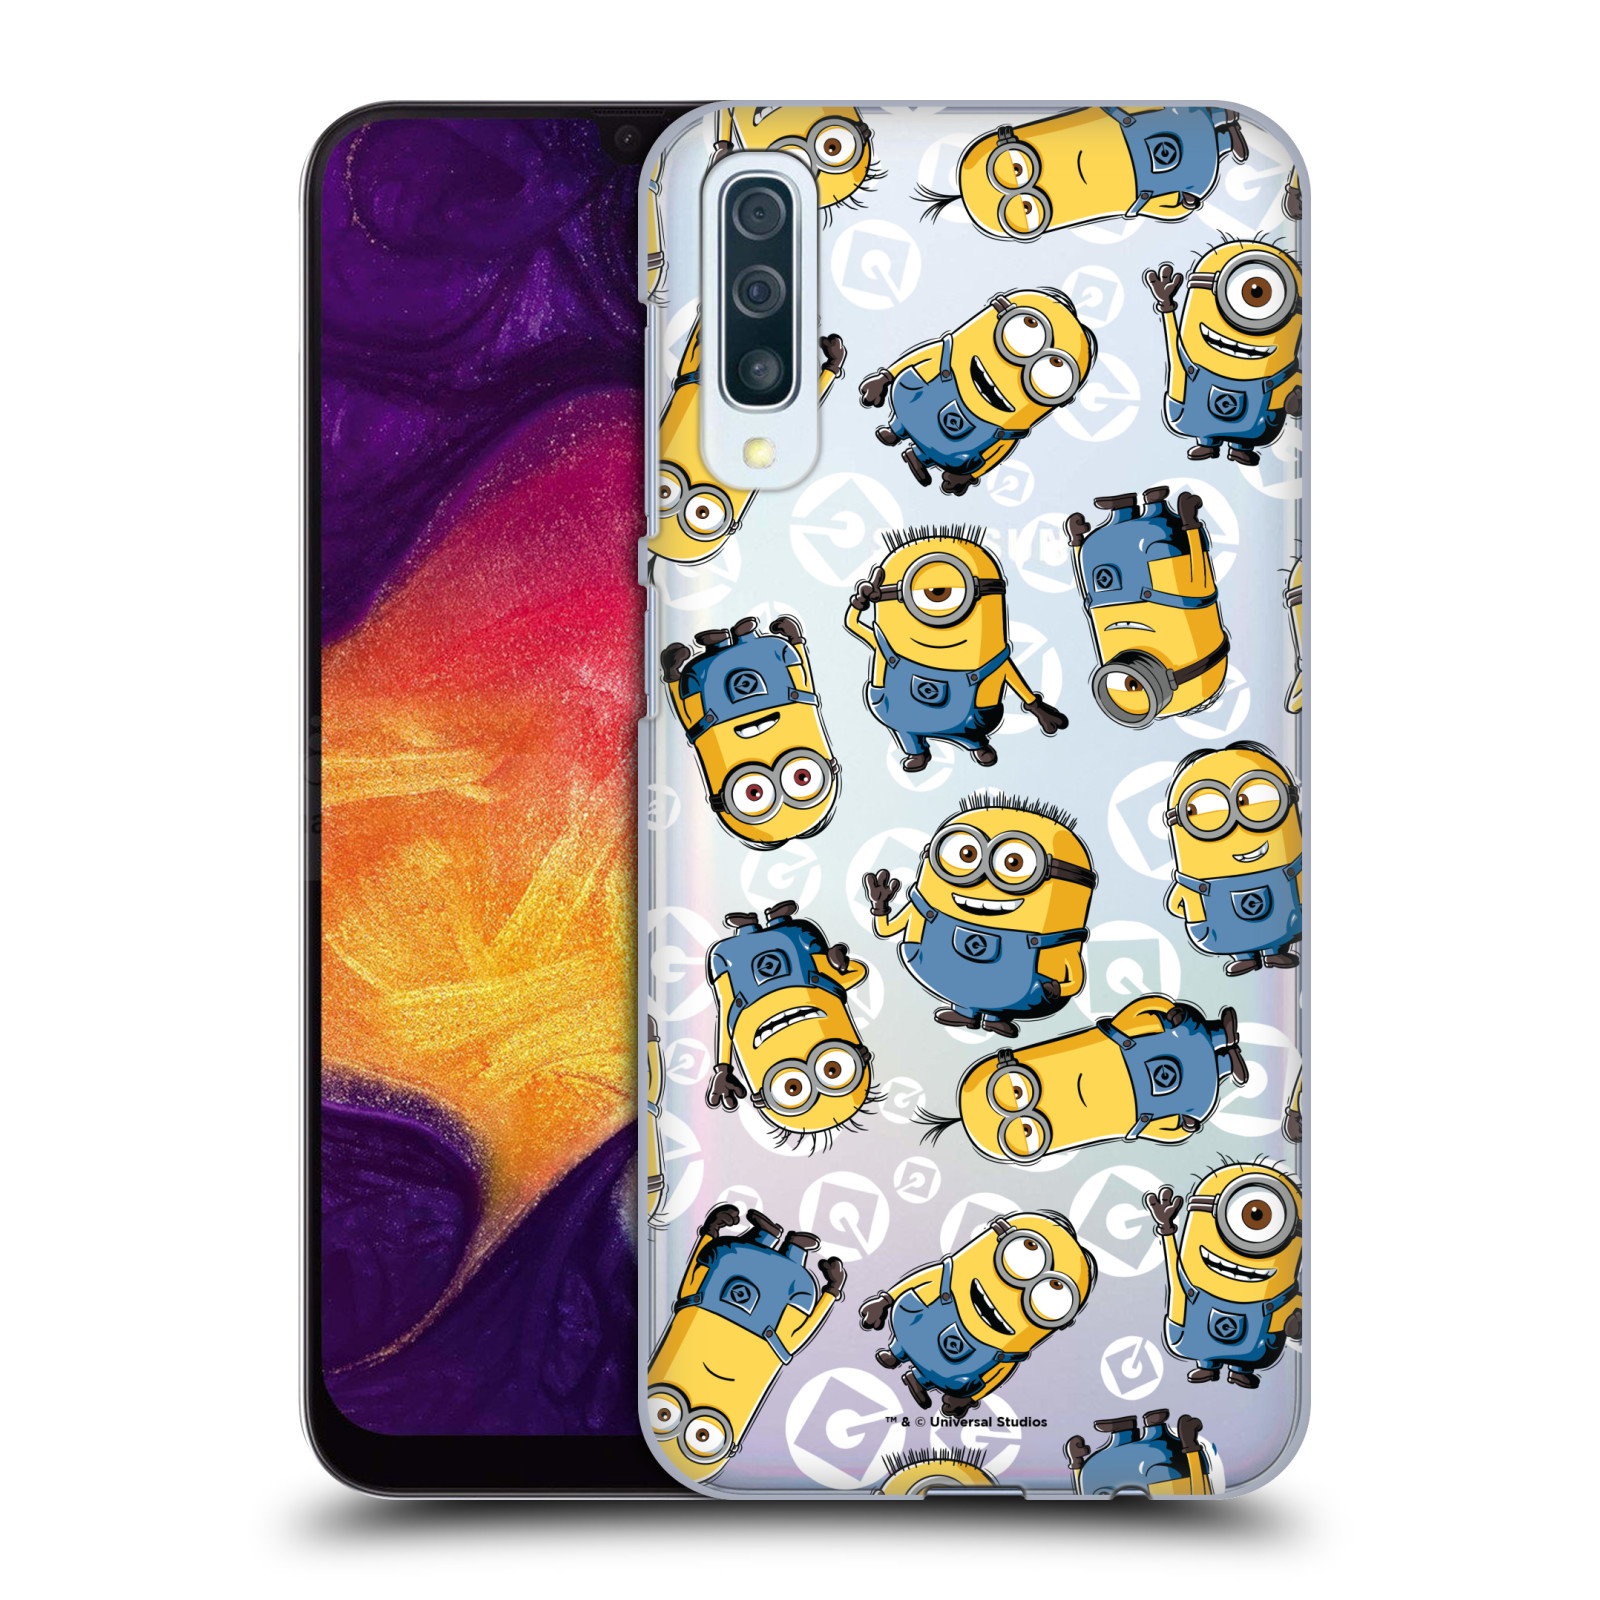 Plastové pouzdro na mobil Samsung Galaxy A50 - Head Case - Minion pattern z filmu Já, padouch - Despicable Me